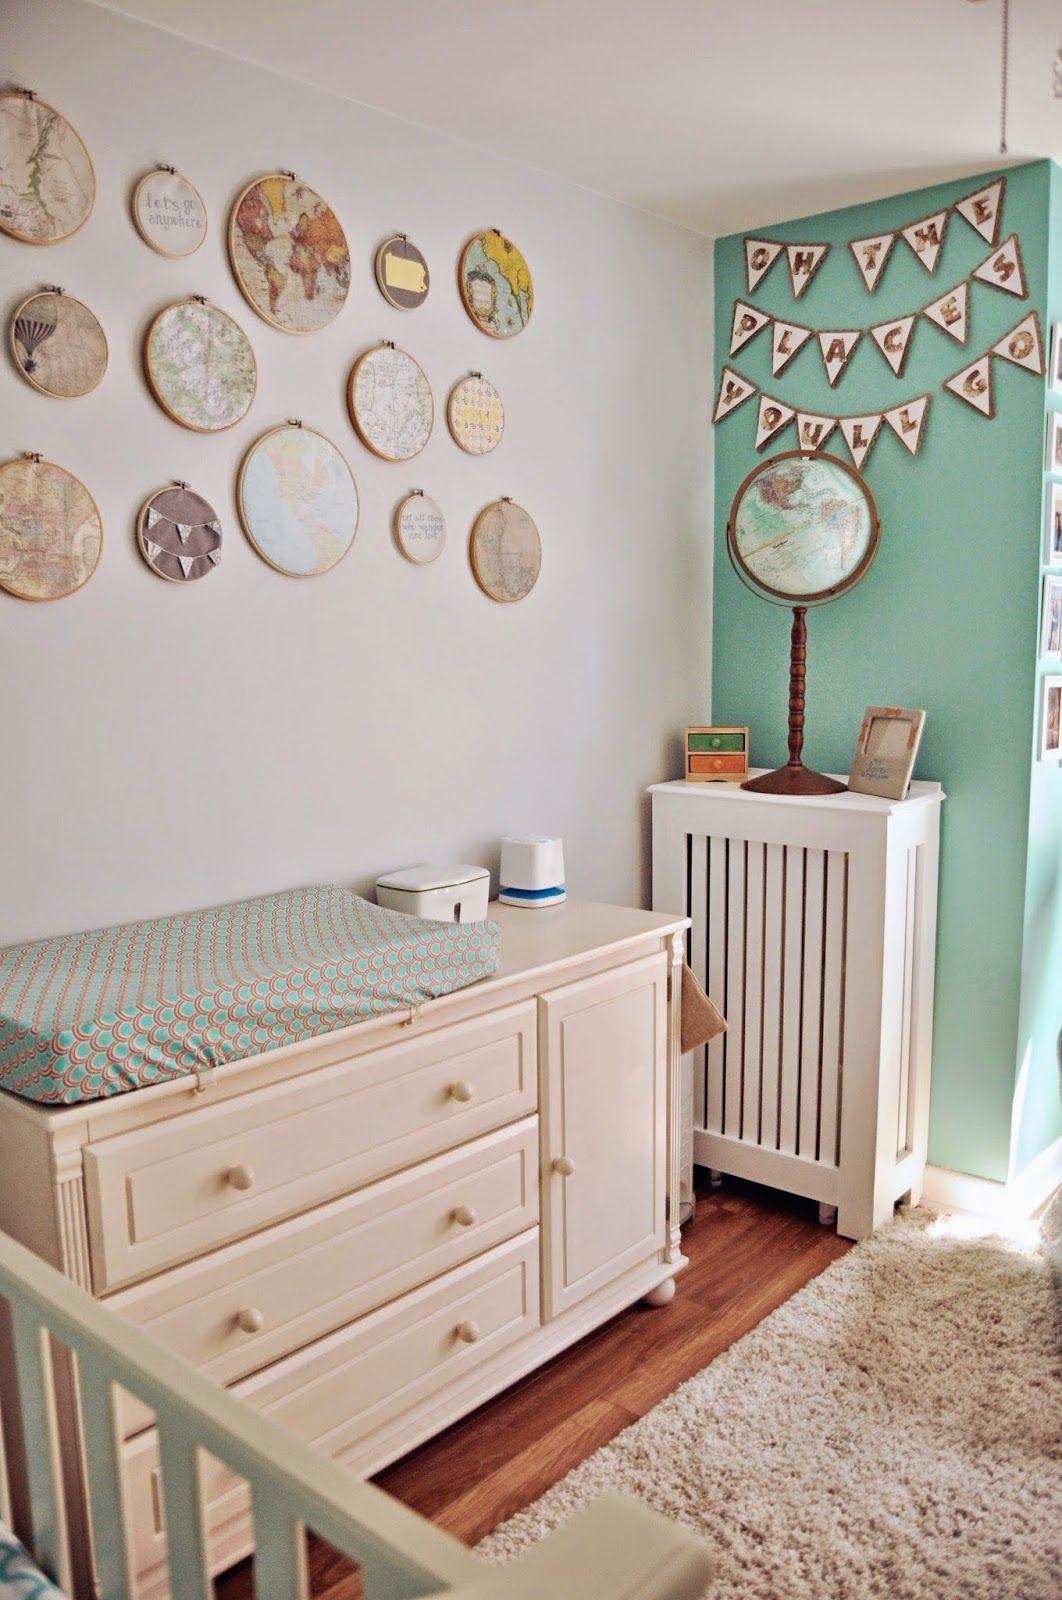 Baby Boy Room Themes Travel: Gender Neutral Nursery Travel Themed Nursery Hot Air